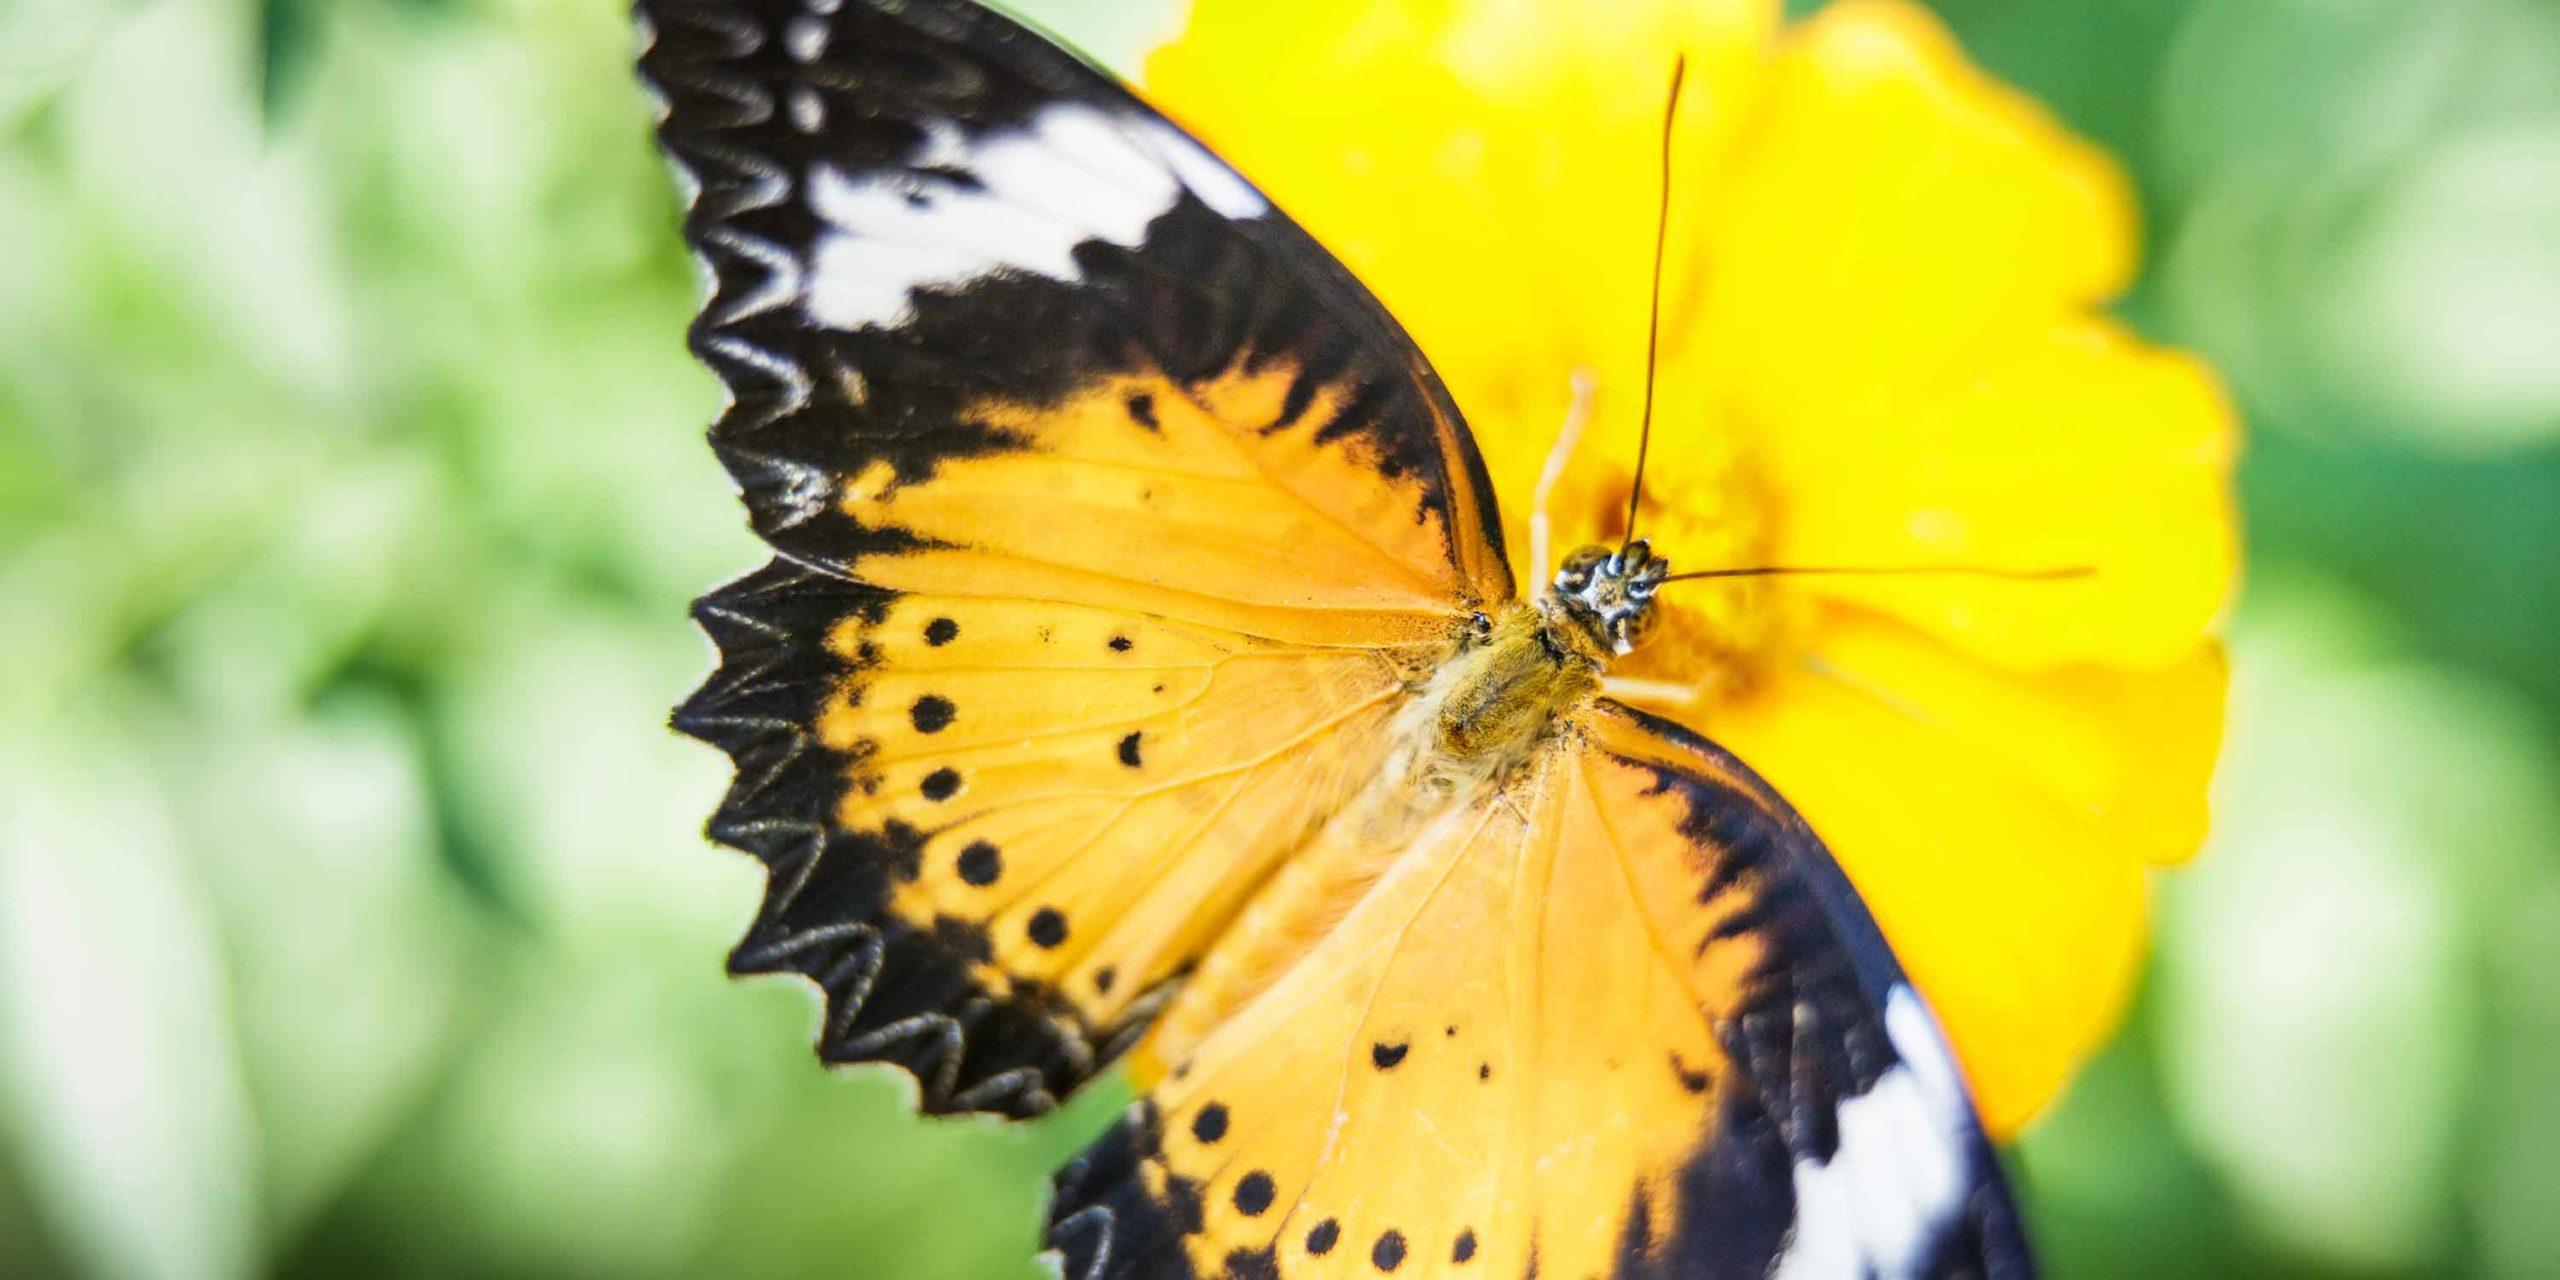 Banteai Srei Butterfly Centre